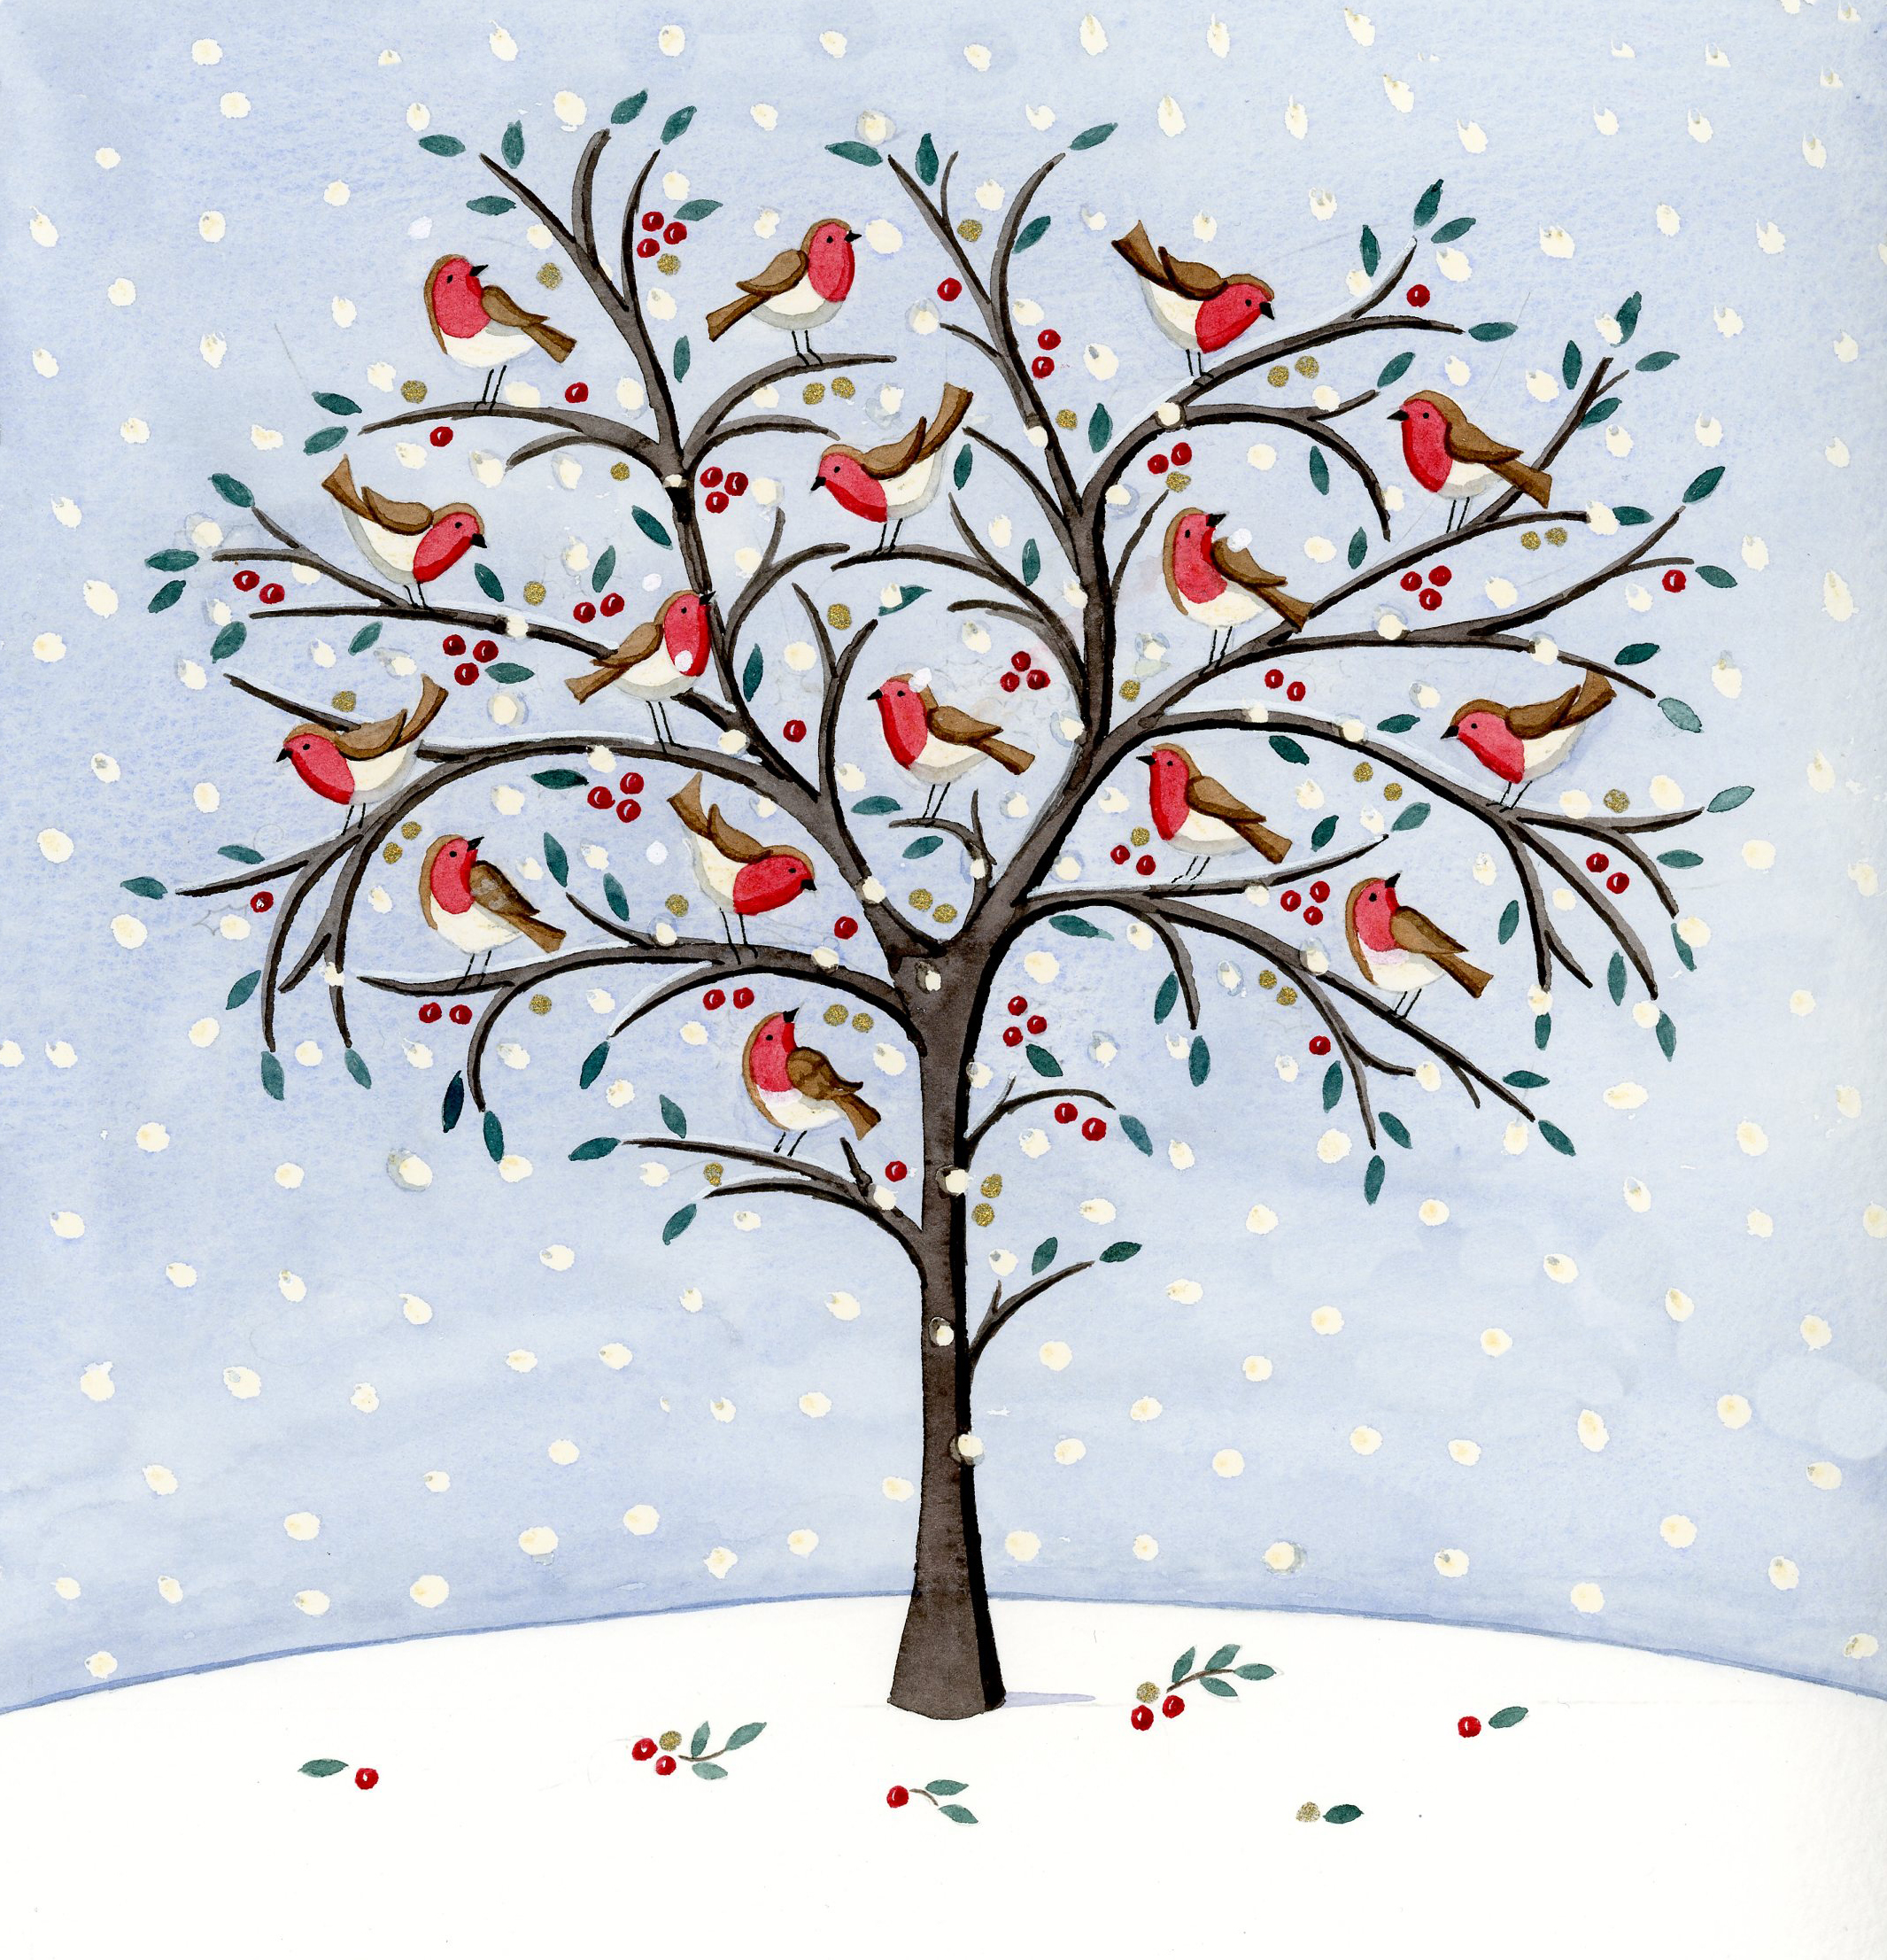 Tree of Robins